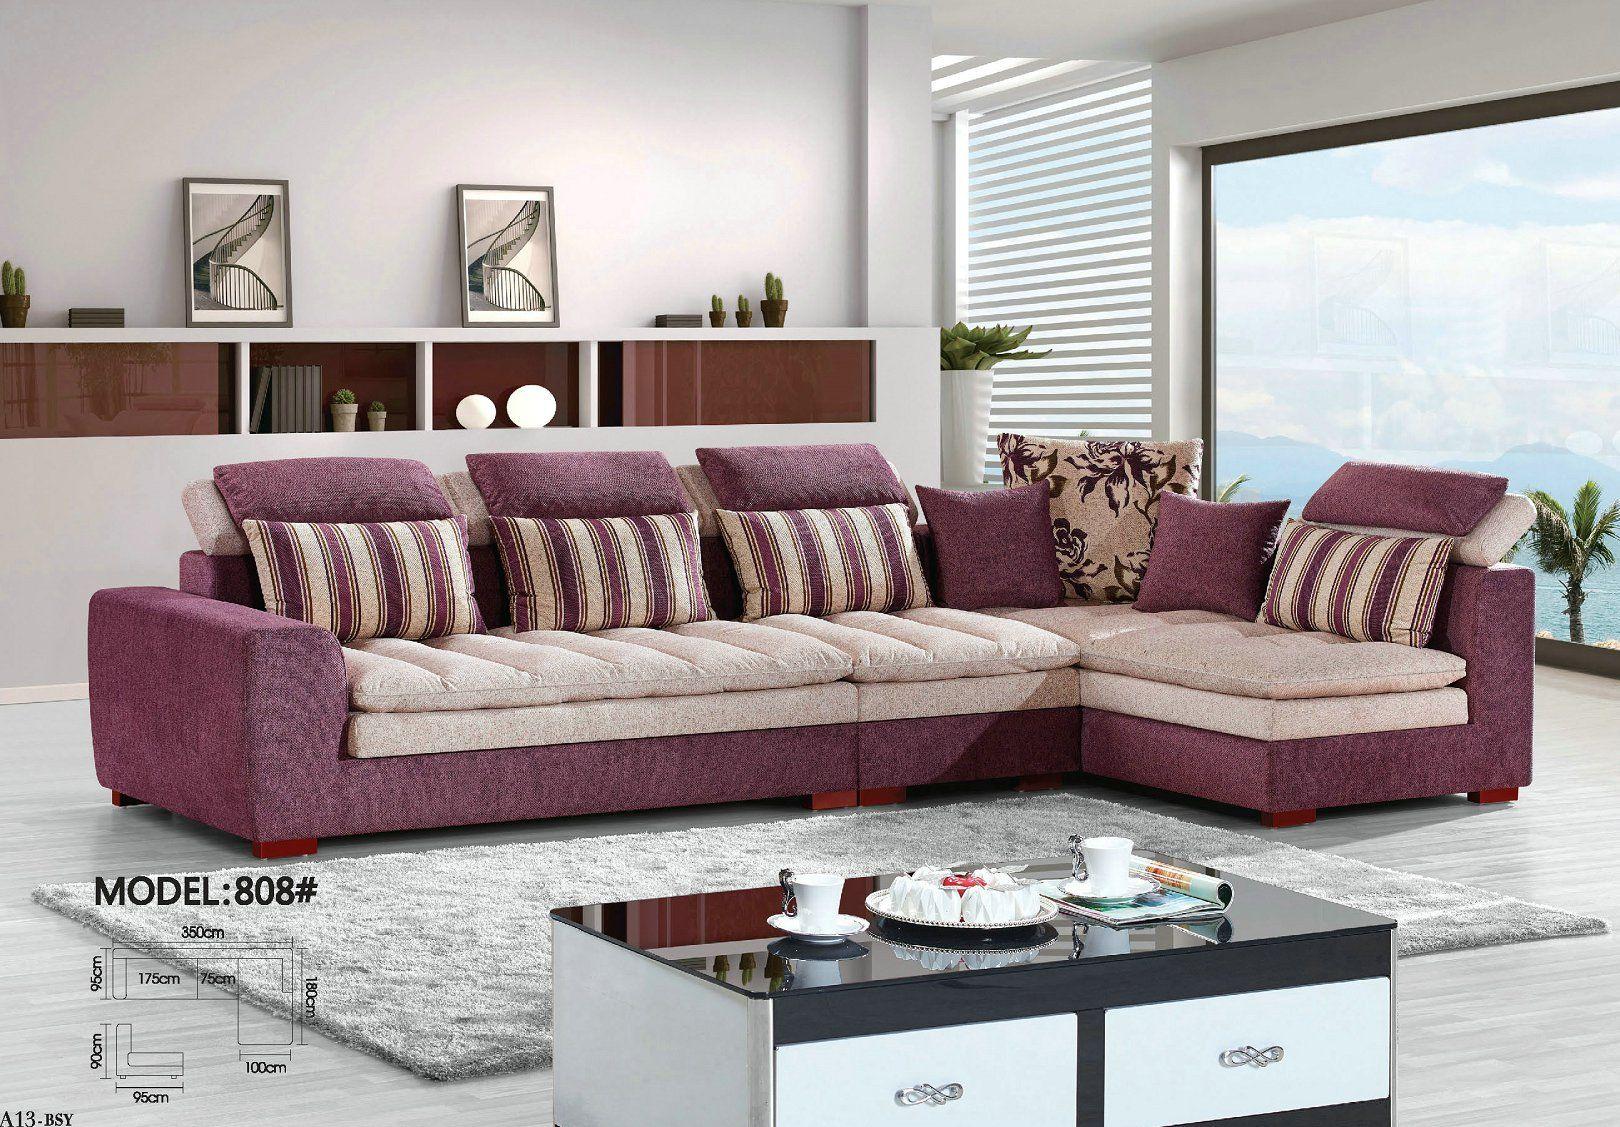 Pin By Molan On Modern Fabric Sofa Living Room Sofa Design Sofa Set Designs Corner Sofa Design